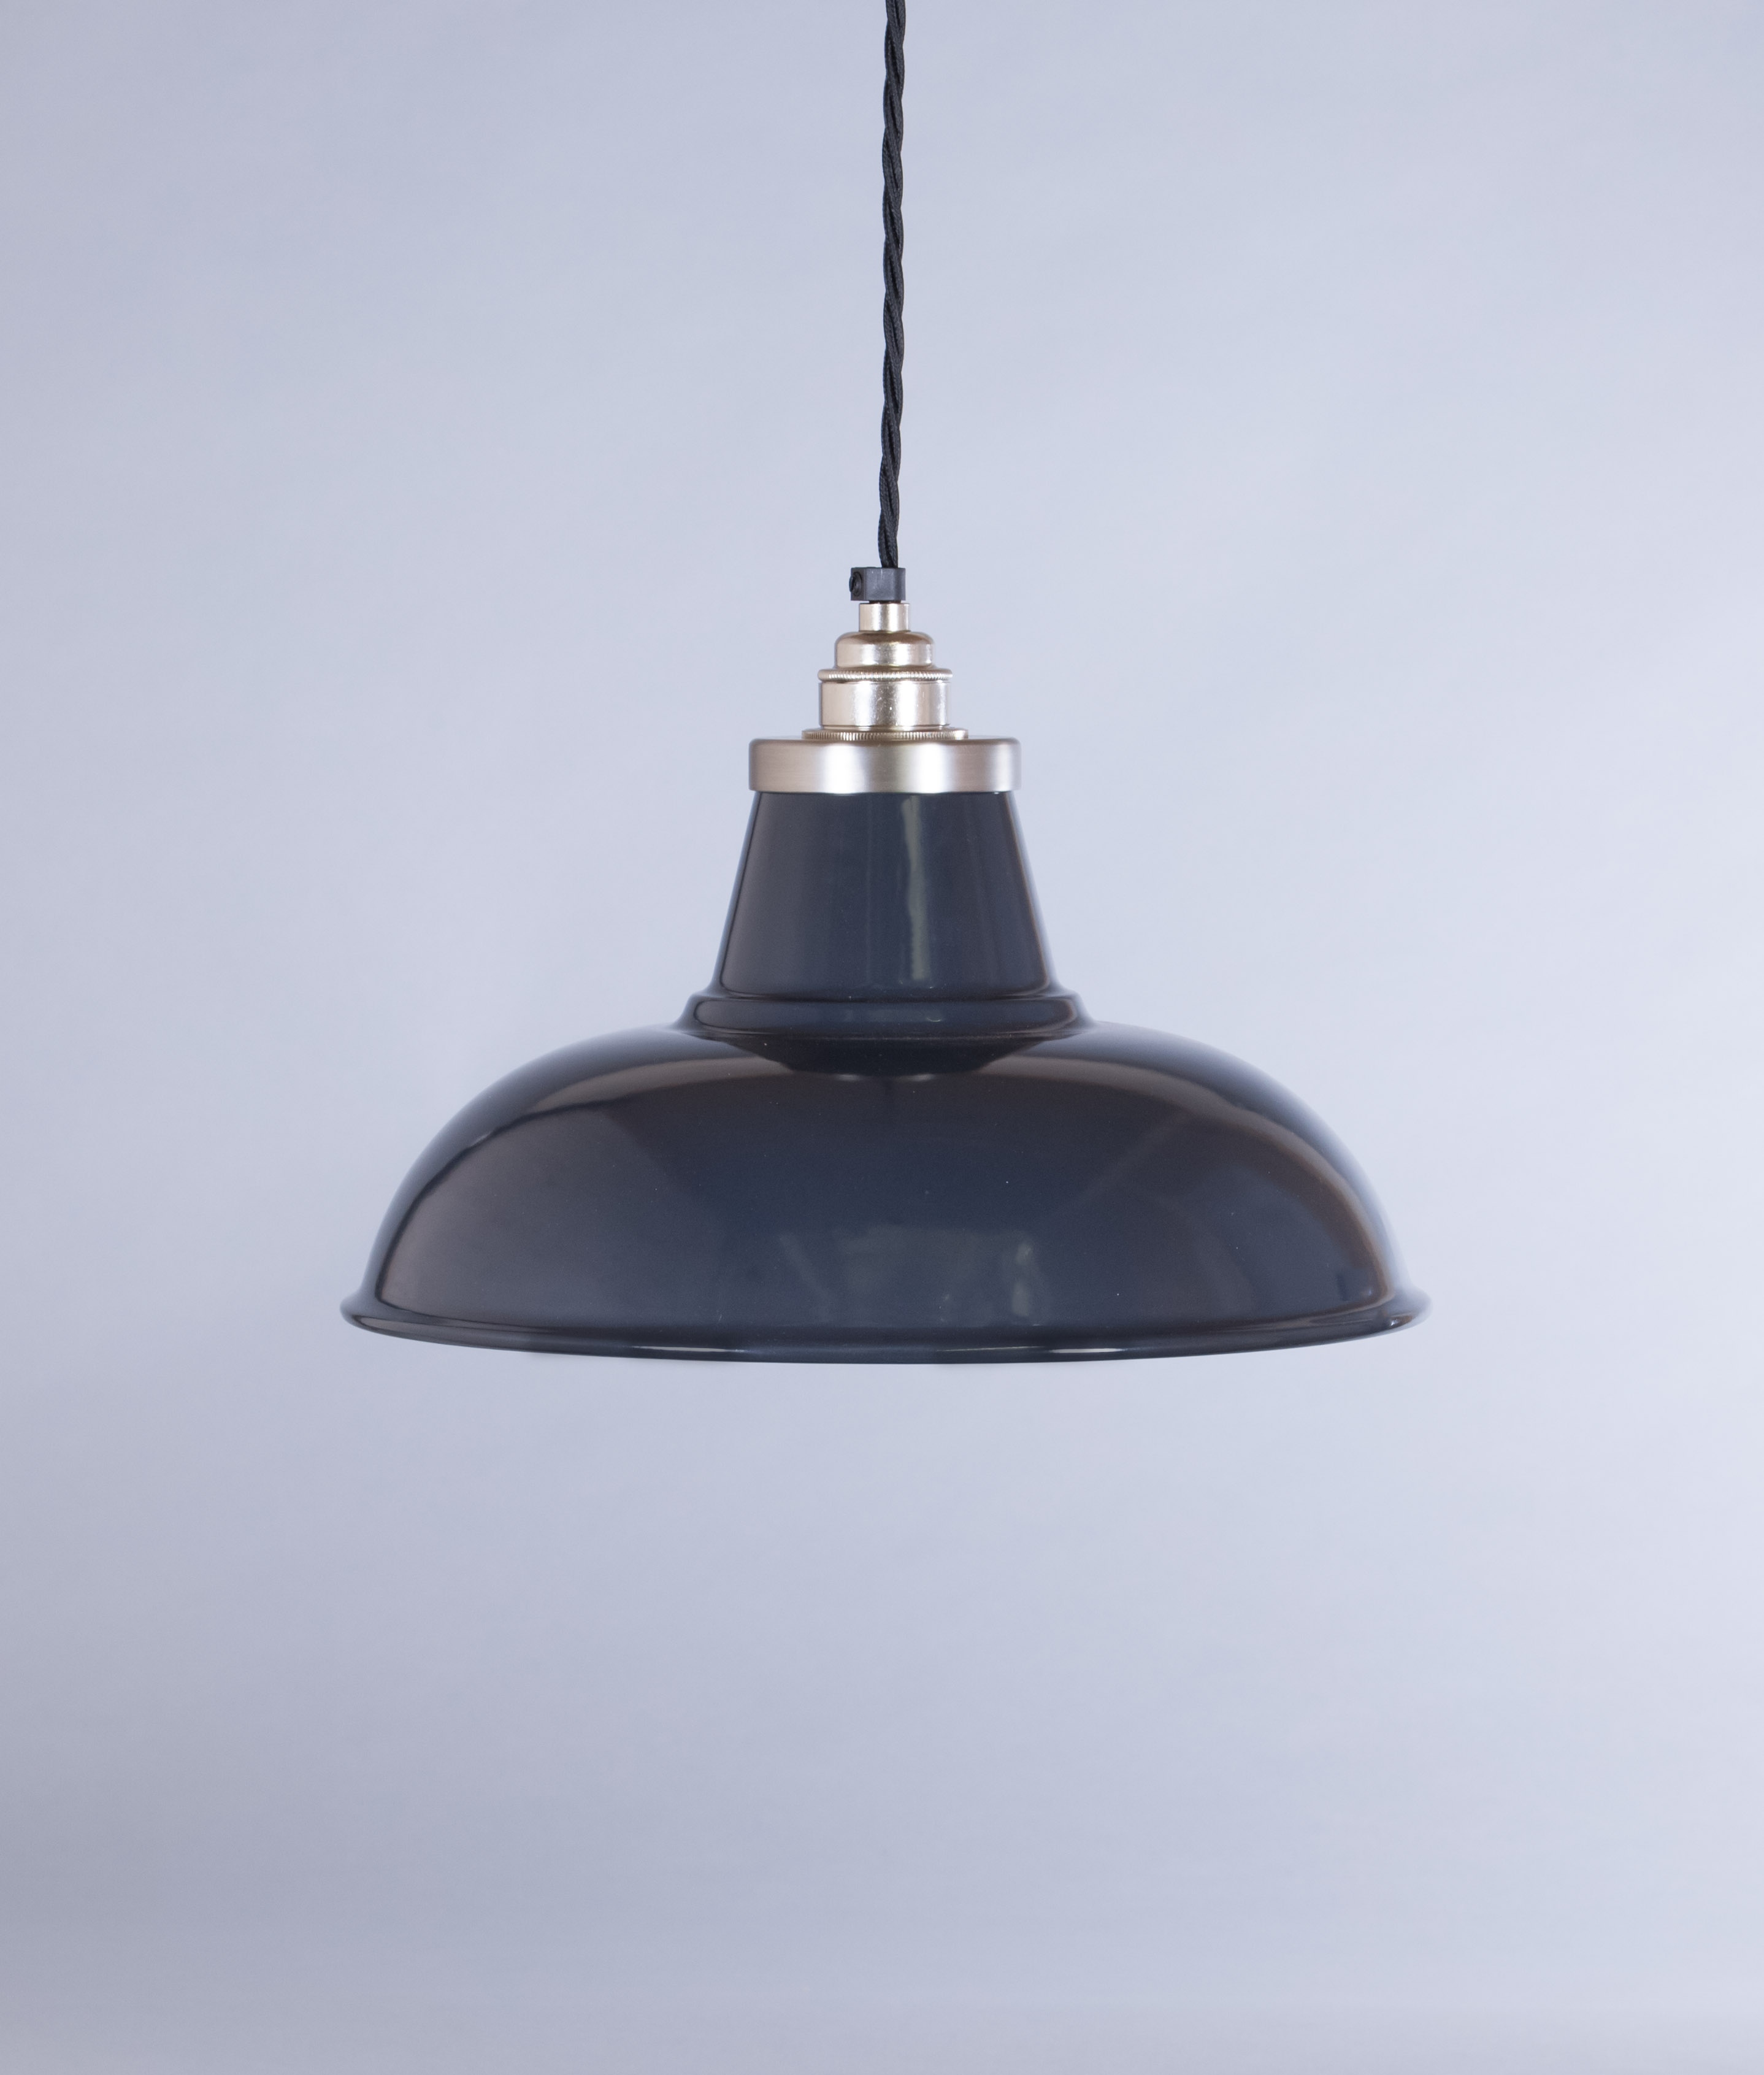 Grey Enamel Pendant Light Shade Morley Industrial Style